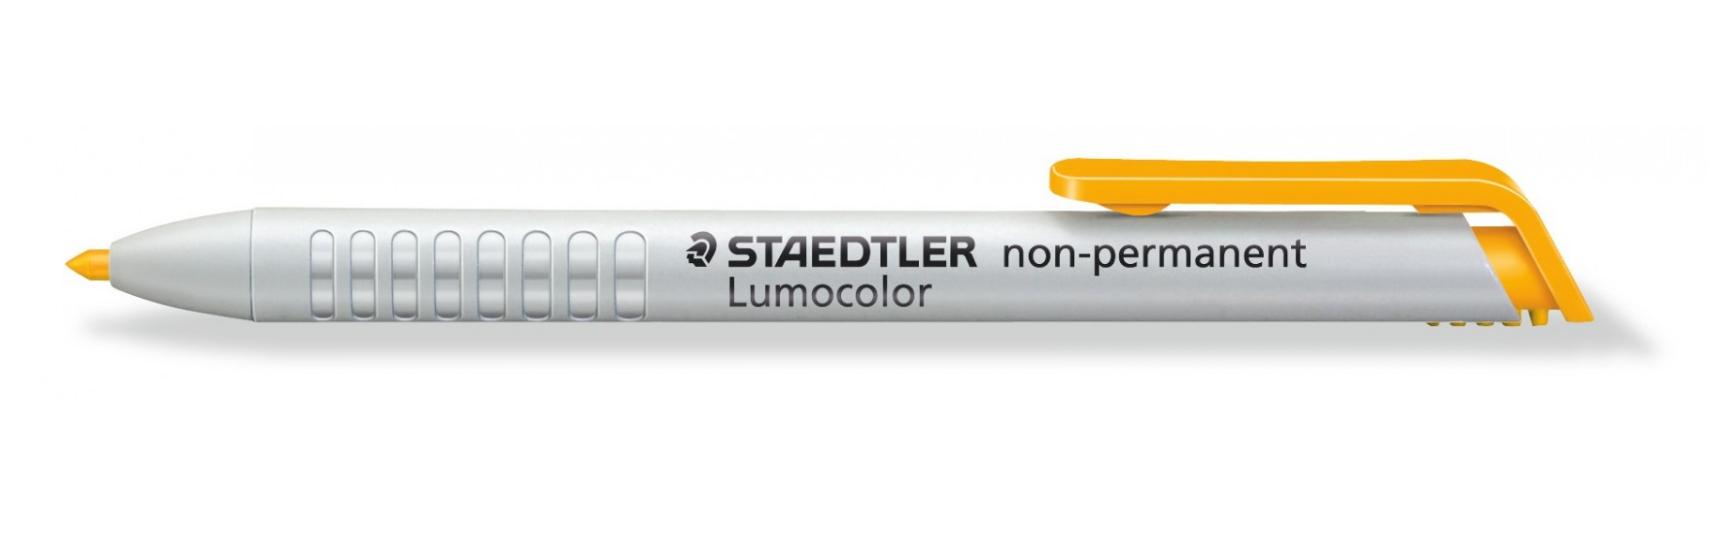 STAEDTLER Lumocolor 768 - Gelb - Rundspitze - Weiß - Gelb - Medium - 3 mm - Glas - Hartplatte - Leder - Metall - Papier - Kunststoff - Stein